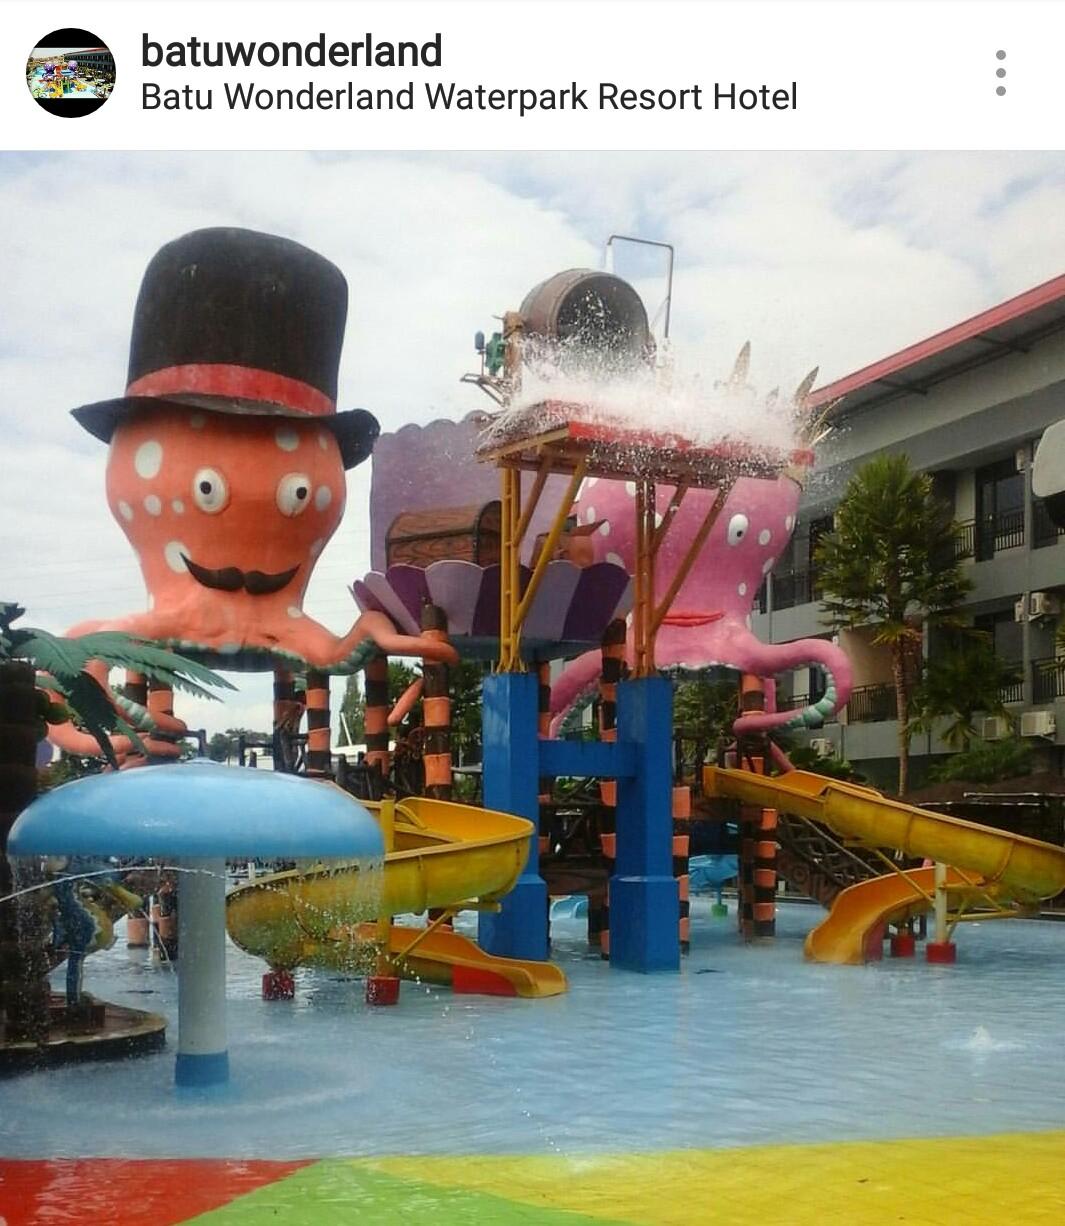 Batu Wonderland Kids Holiday Spots Liburan Anak Informasi Liburananak Batuwonderland